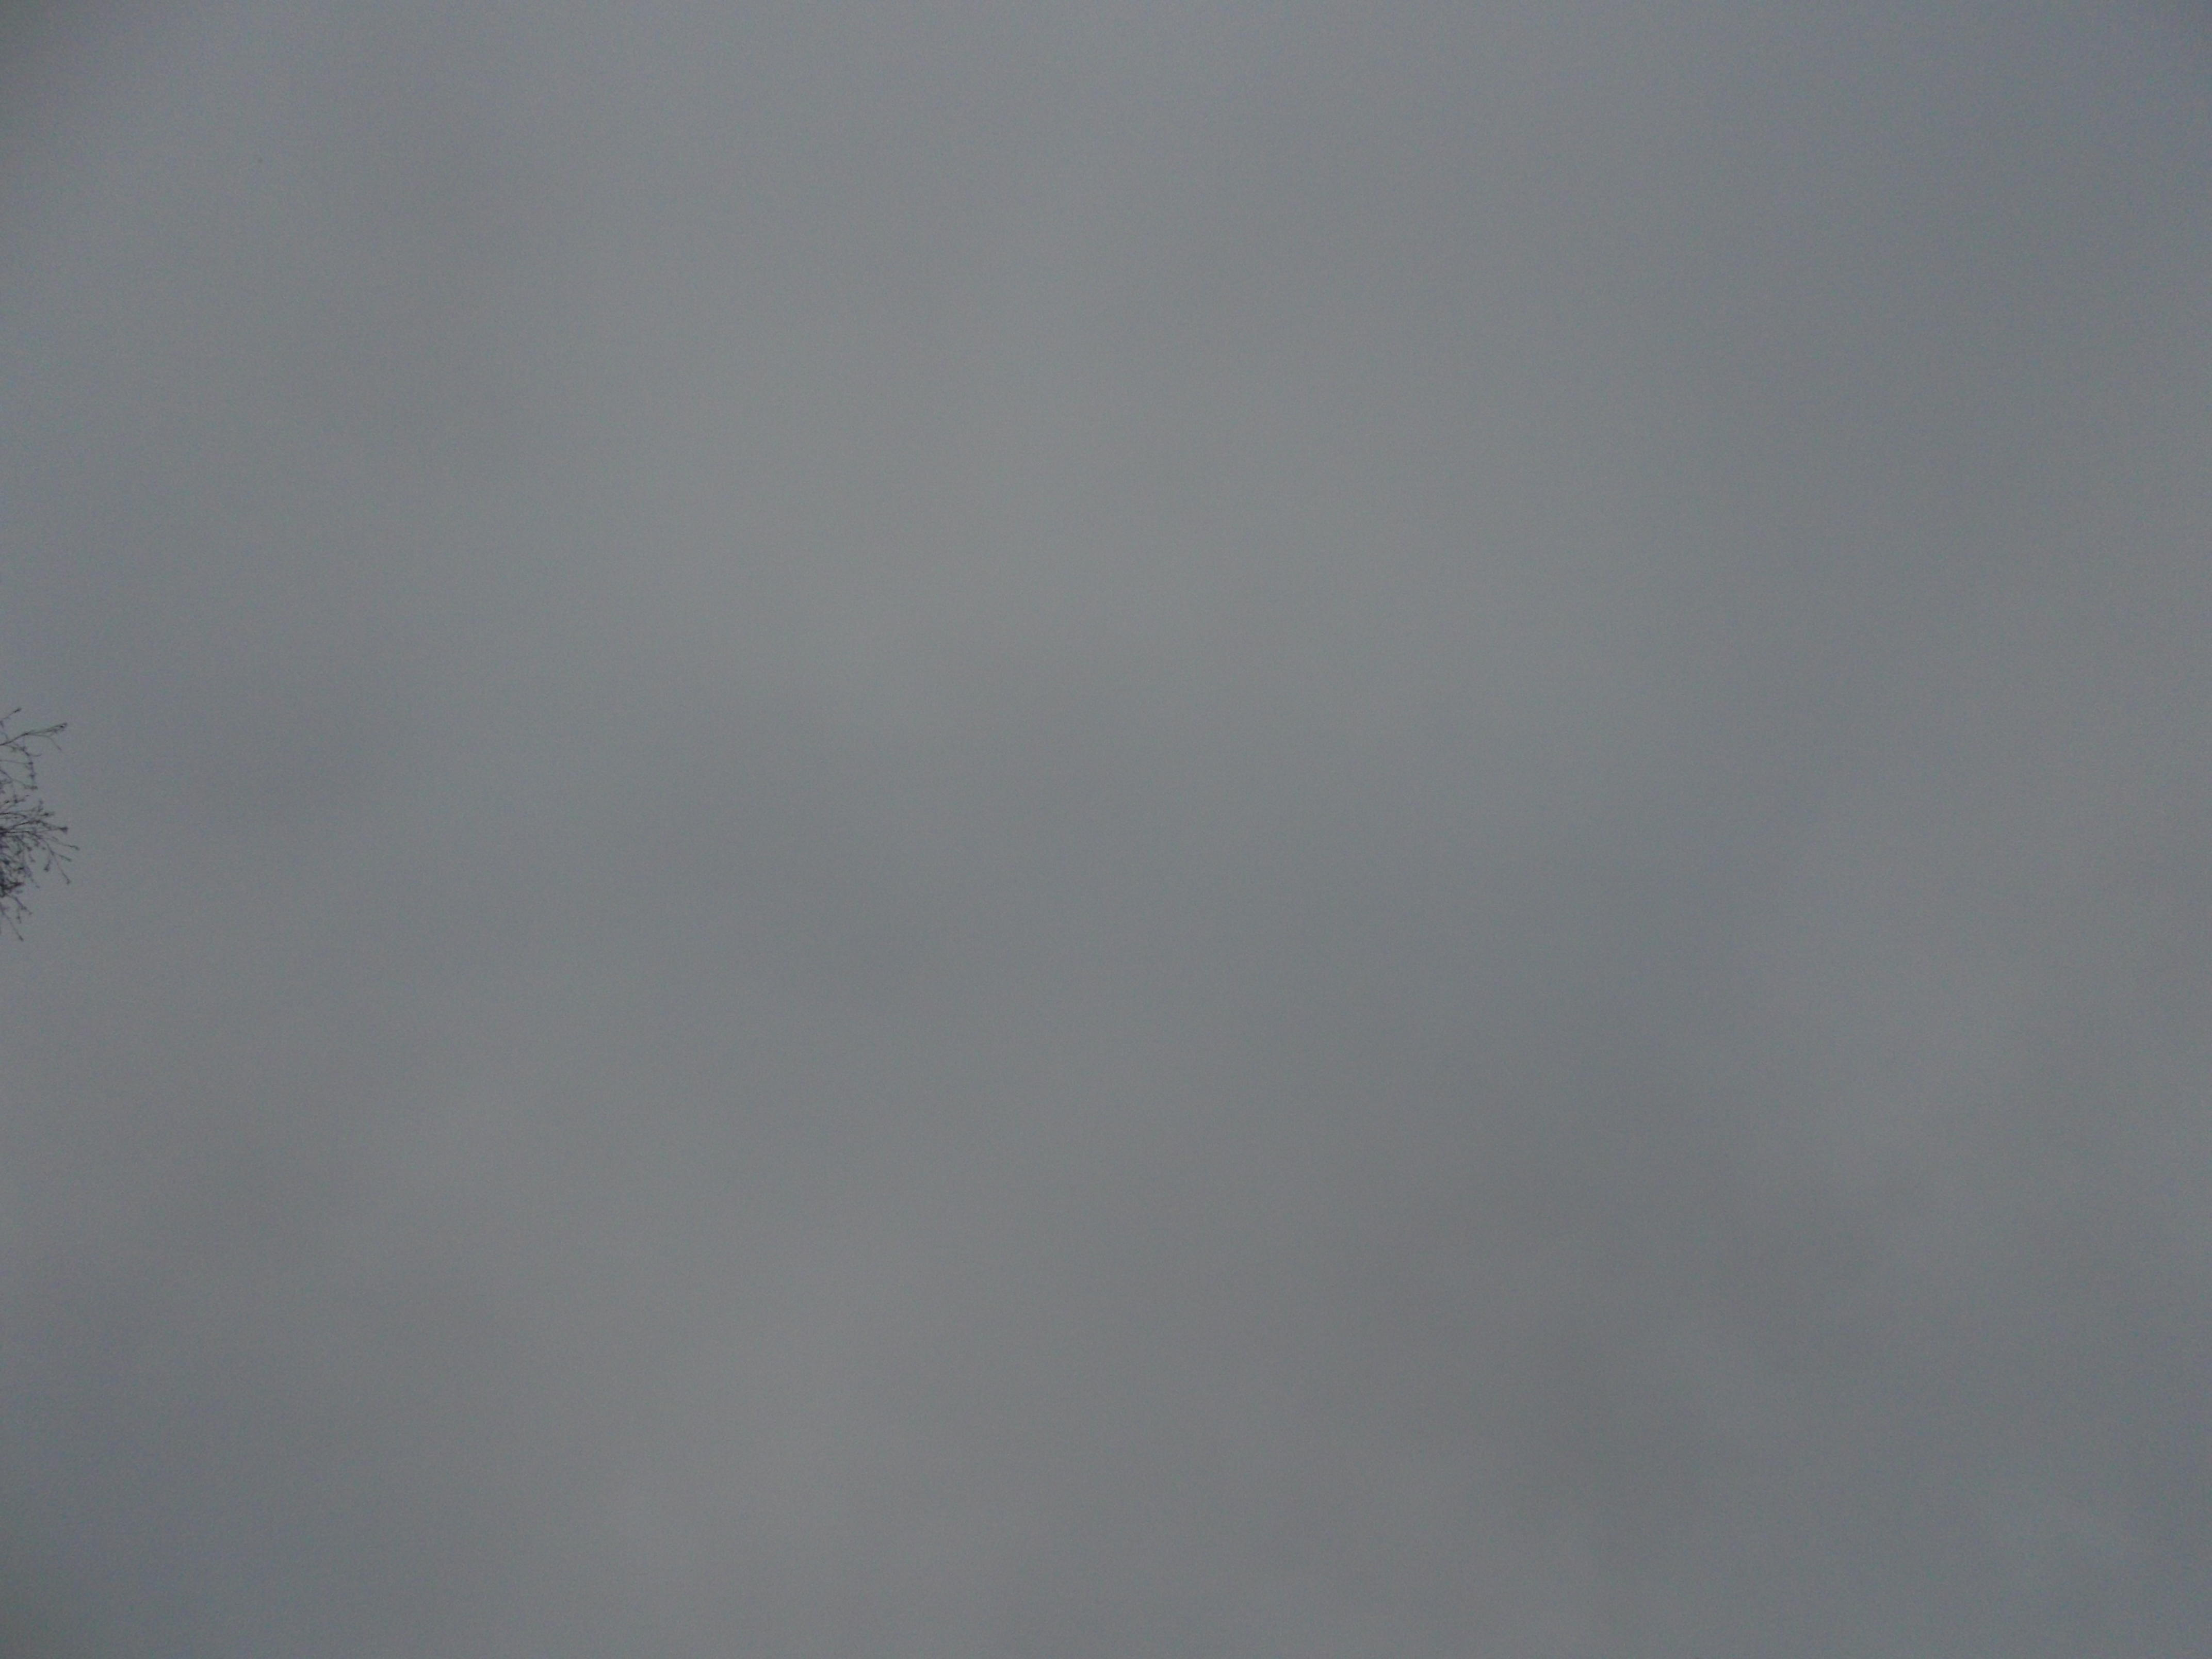 2013-01-08 Longitude -0.371 Latitude 49.182 Altitude 13 Heure 16h45